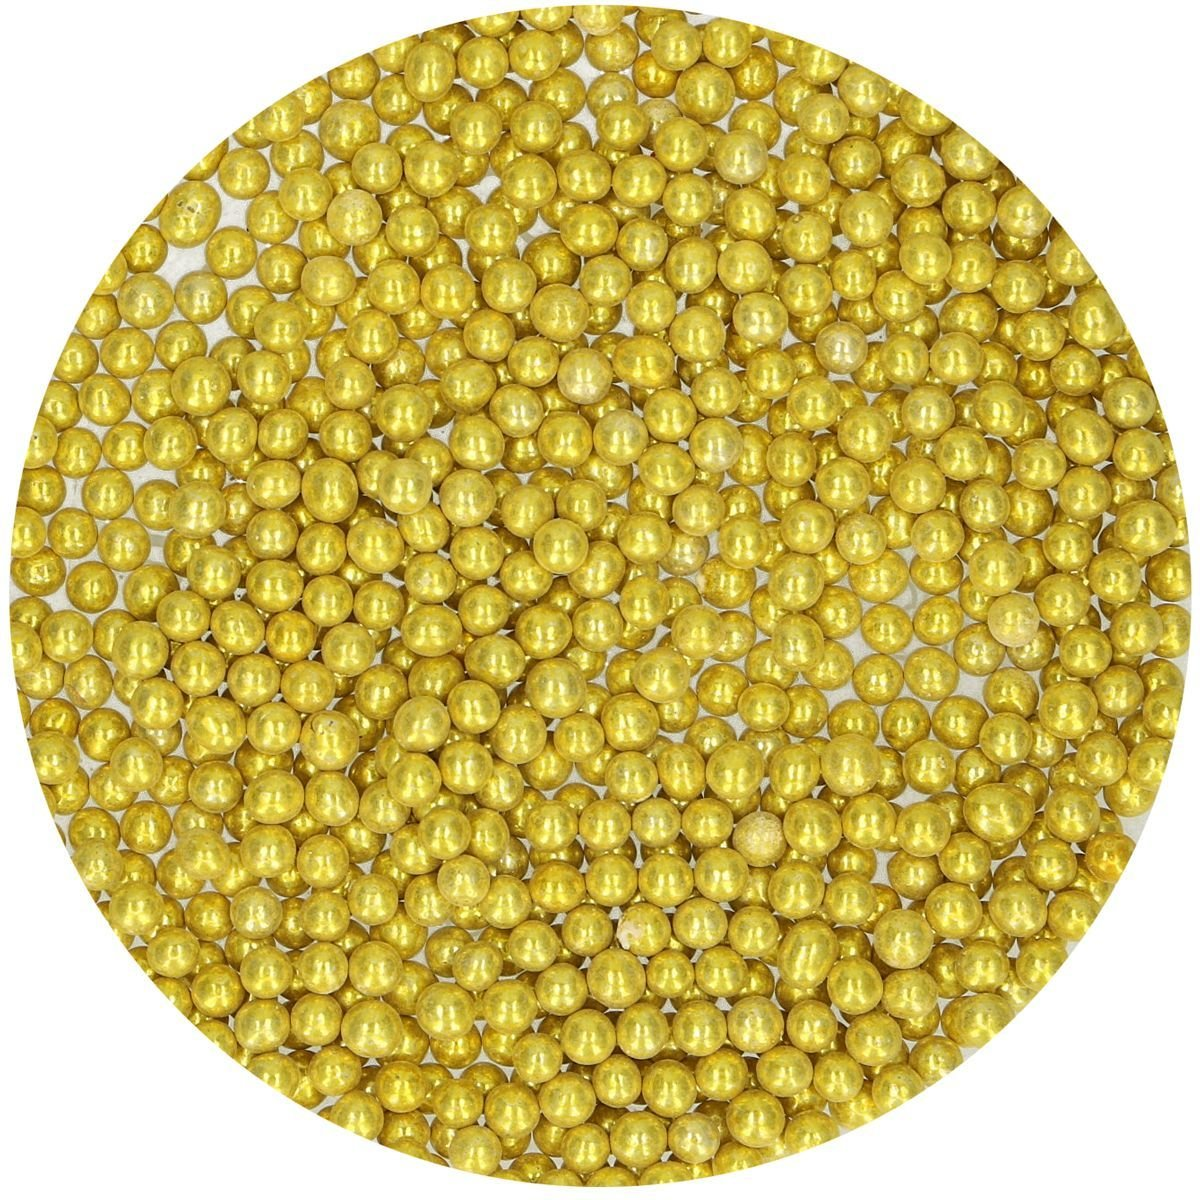 FunCakes Sugarballs -4mm METALLIC GOLD 80g - Μείγμα Ζαχαρωτών Χρυσές Μεταλλικές Πέρλες